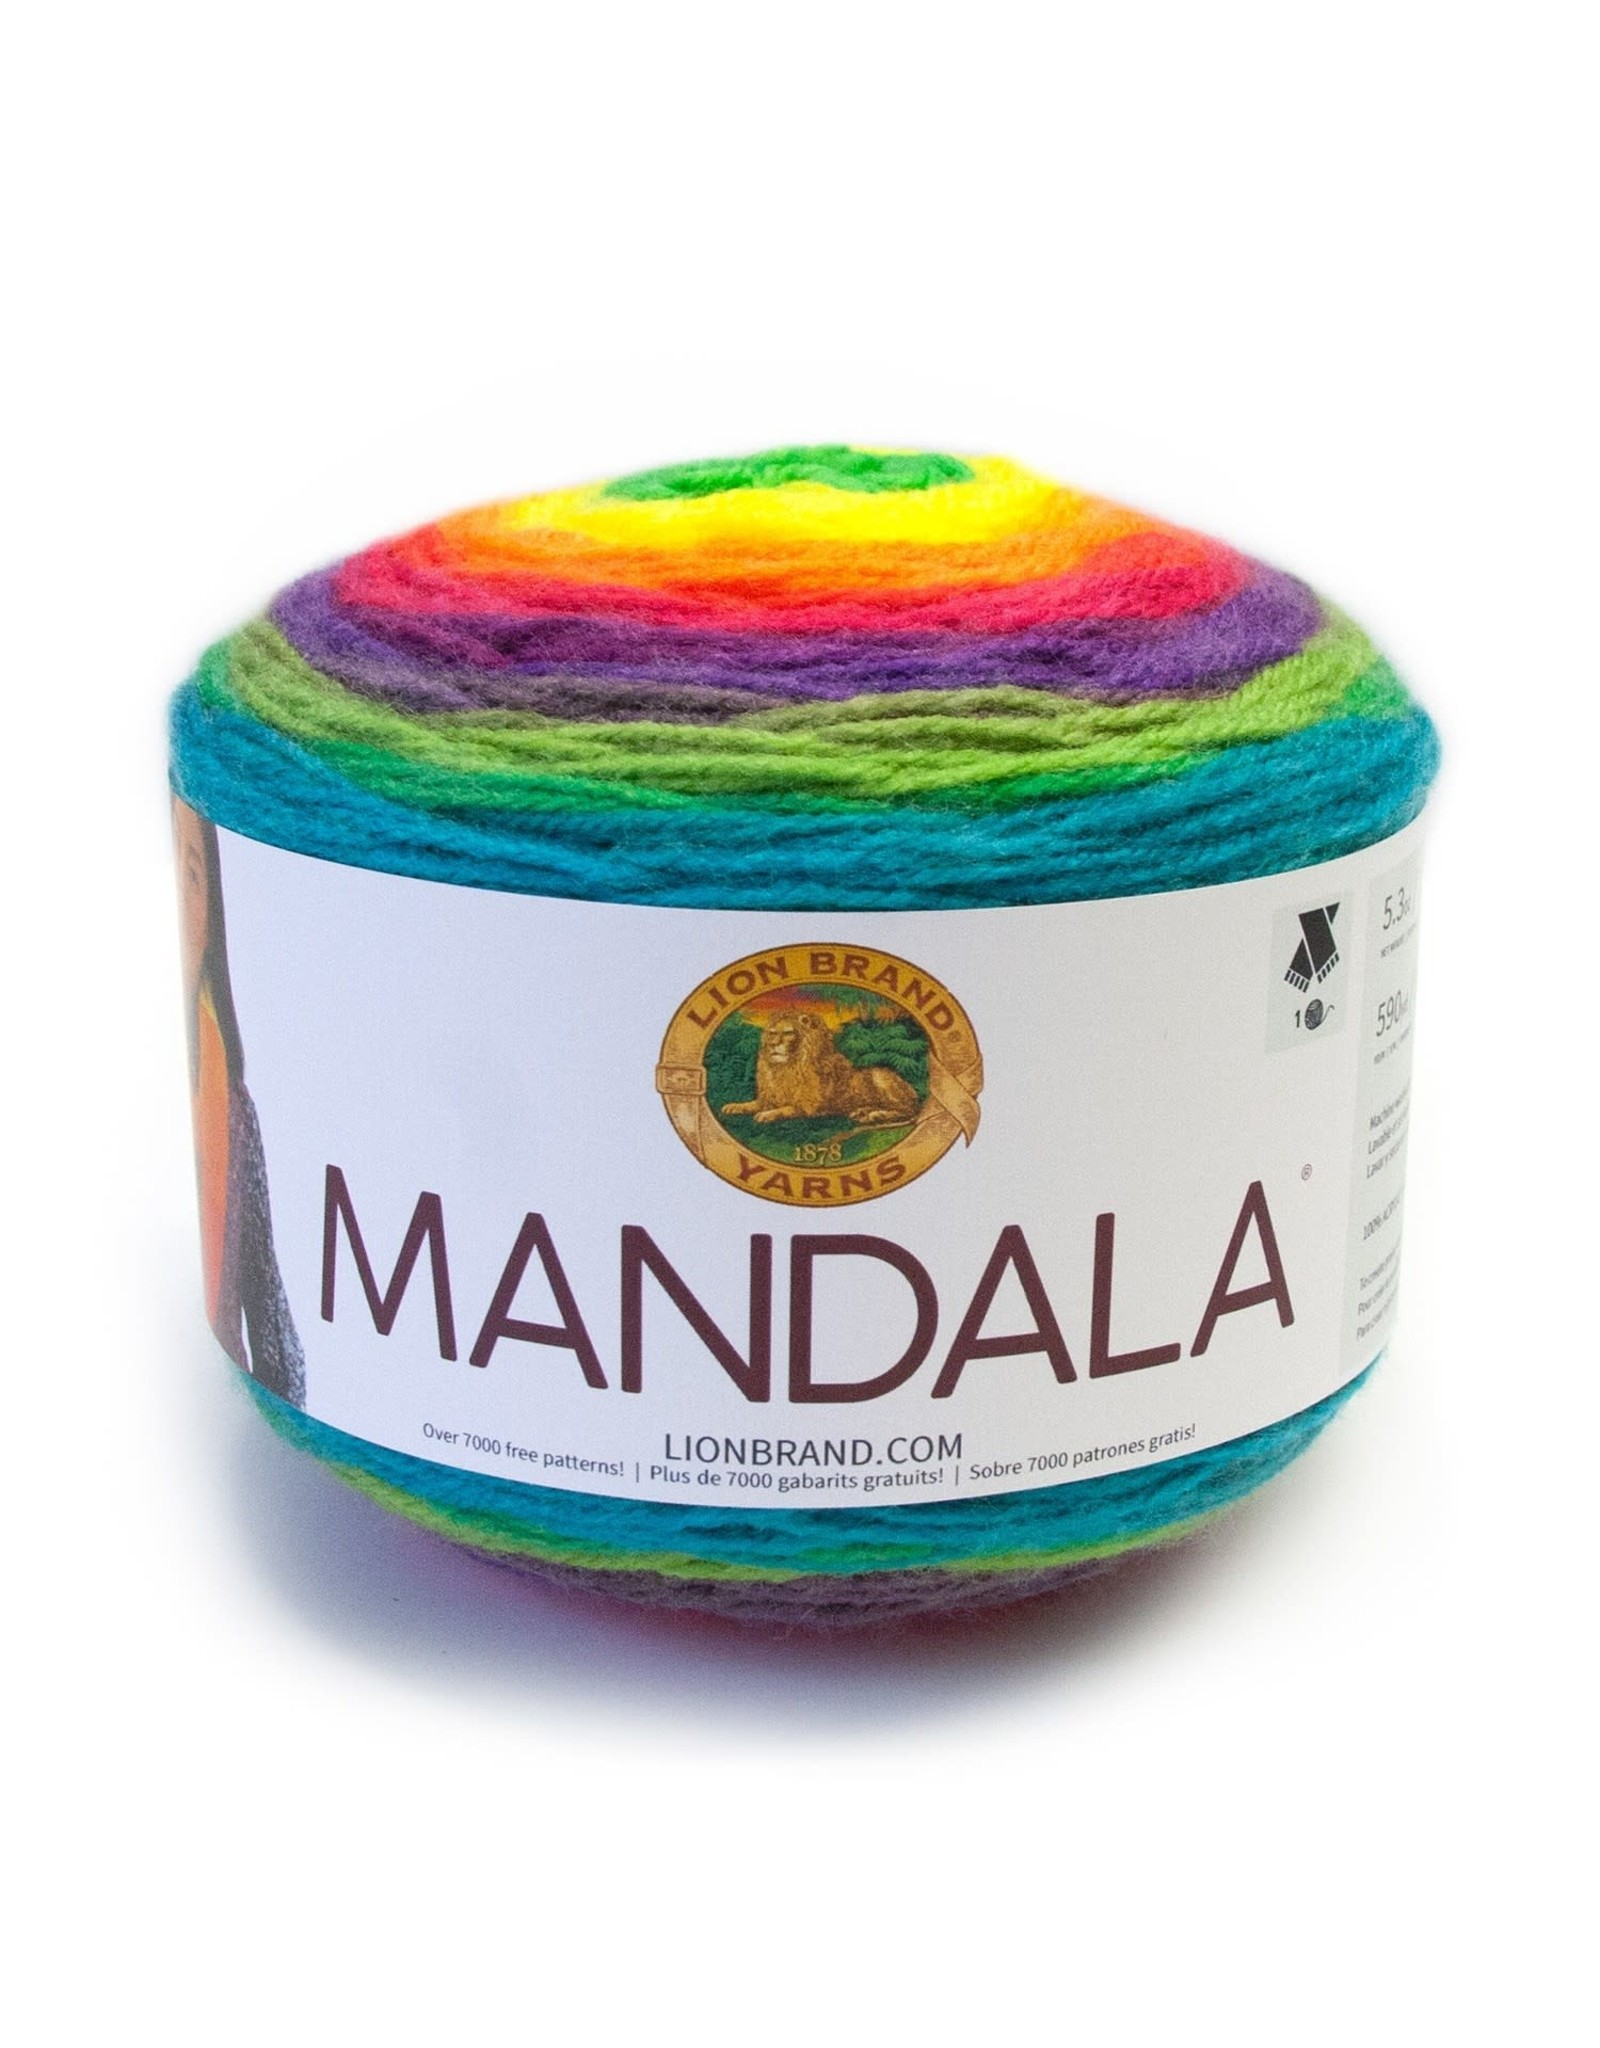 Gnome - Mandala - Lion Brand